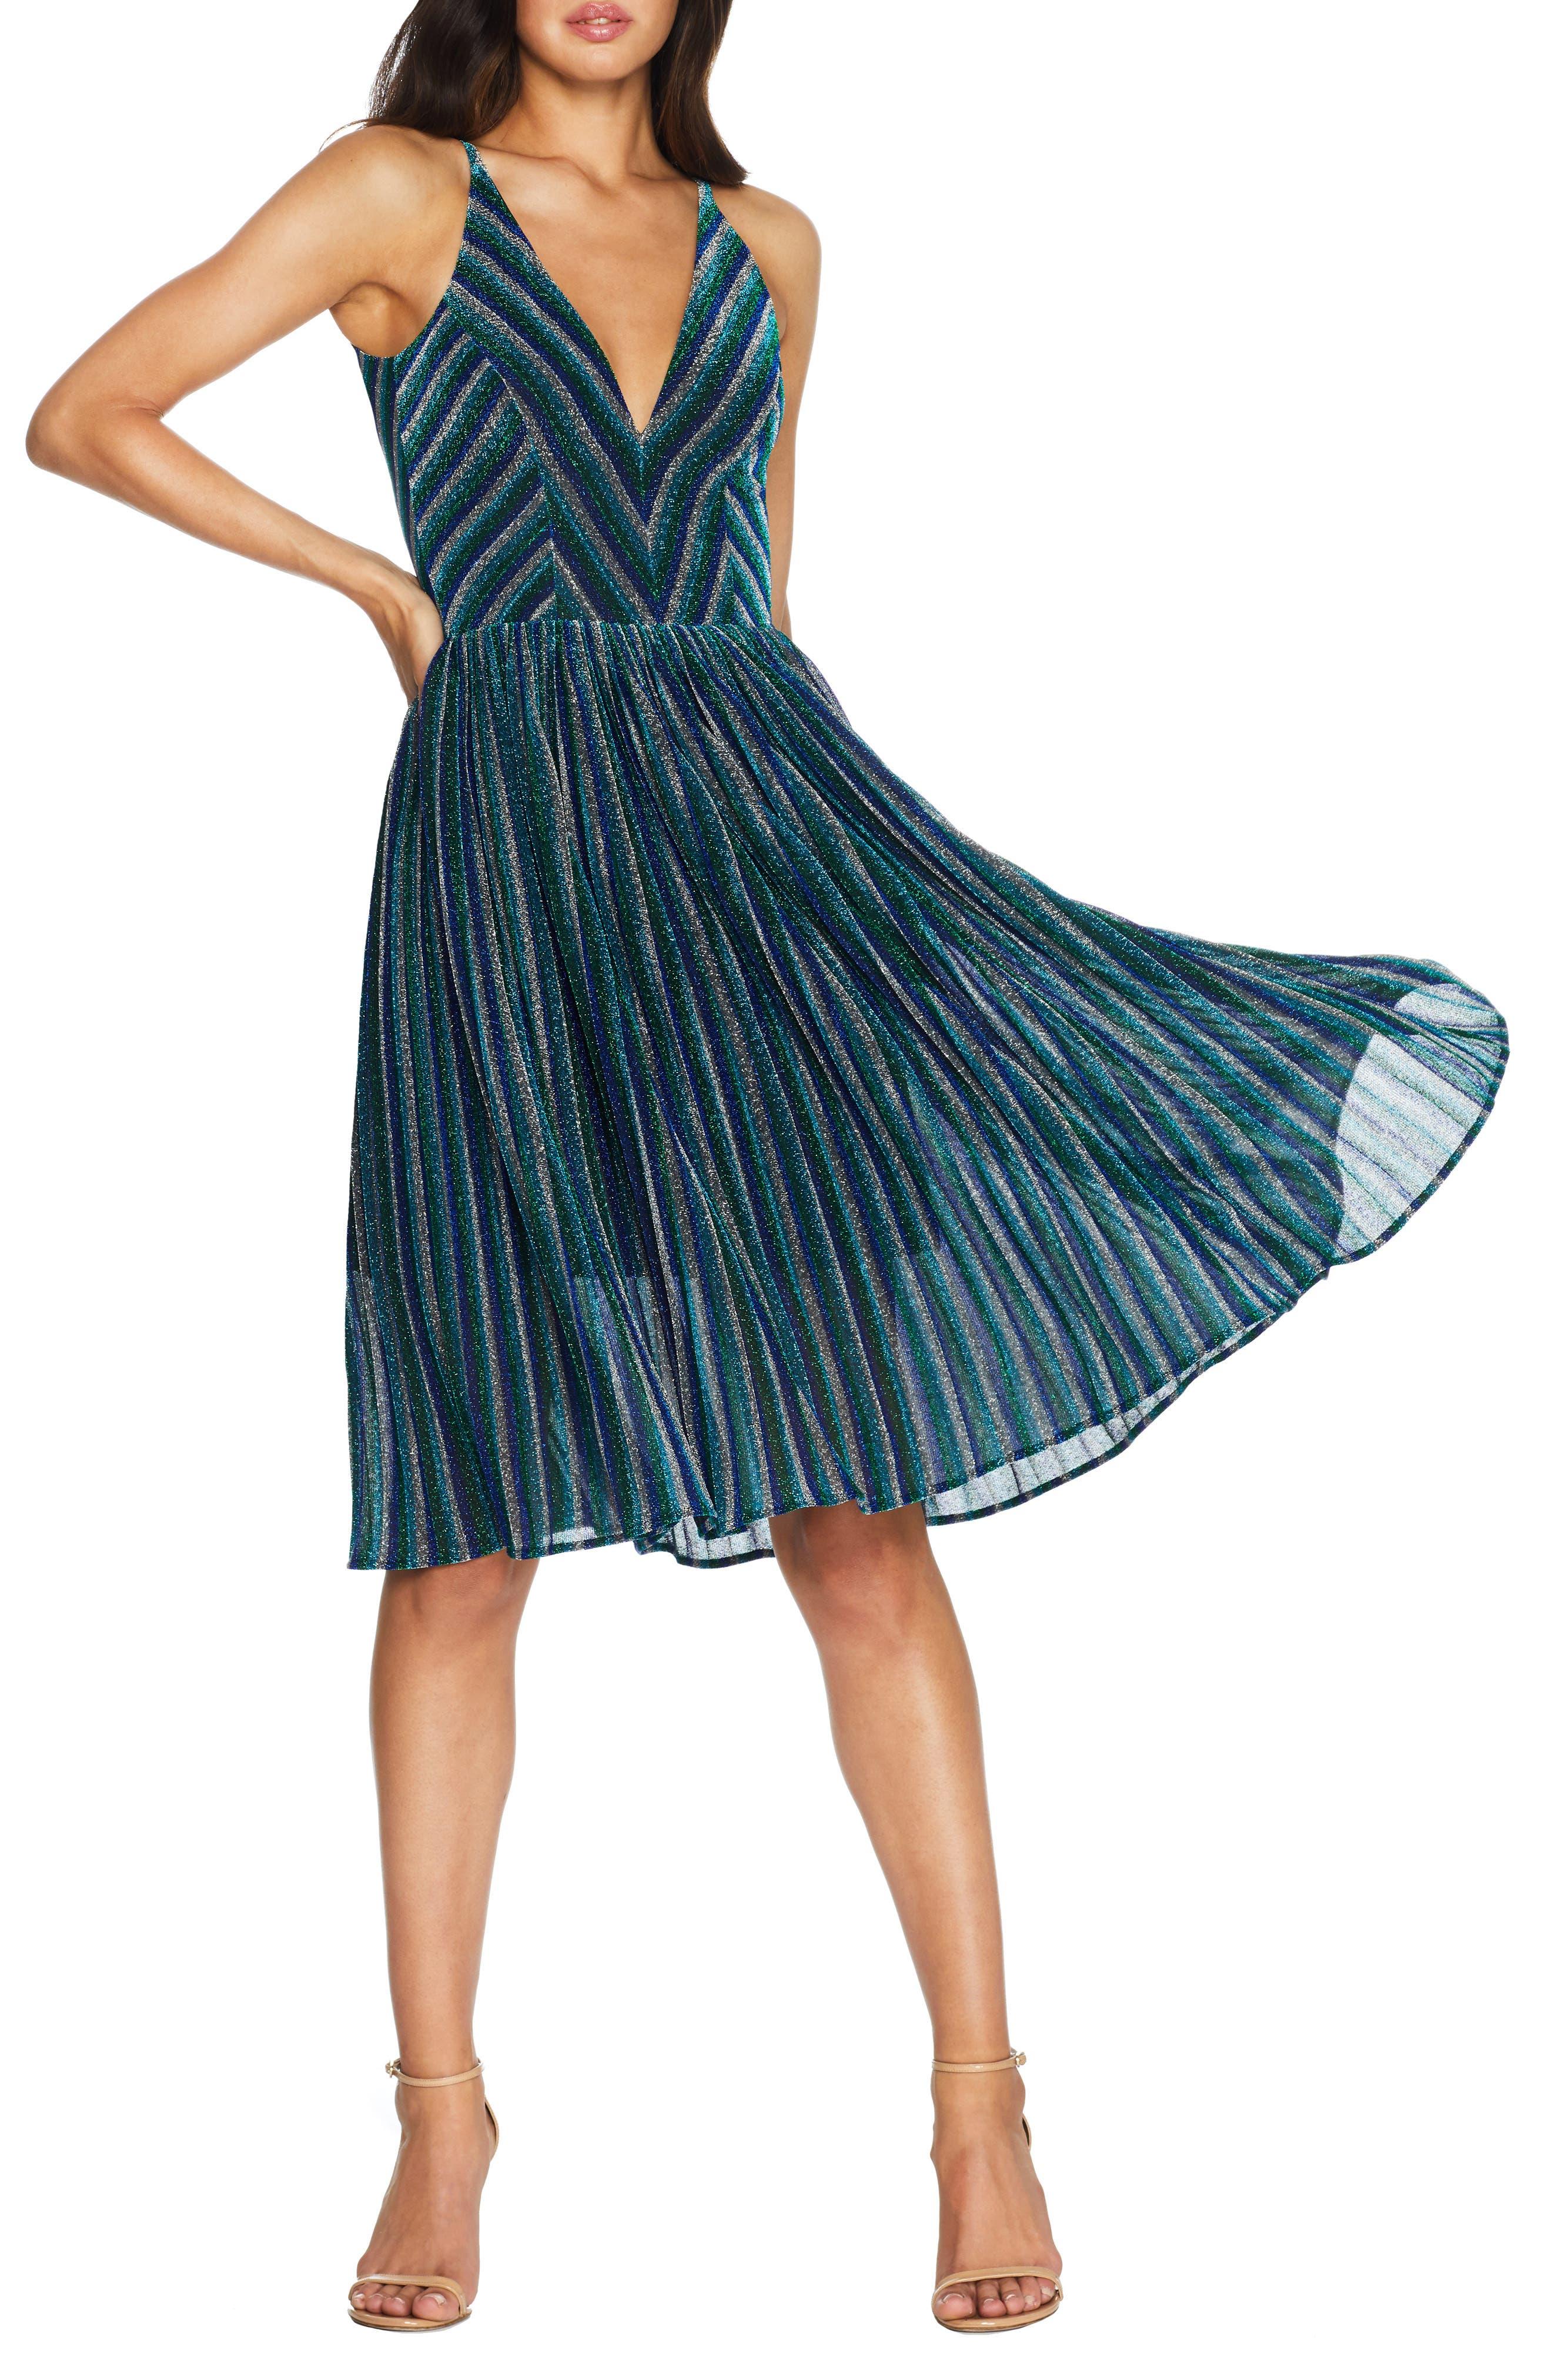 70s Dresses – Disco Dress, Hippie Dress, Wrap Dress Womens Dress The Population Haley Metallic Stripe V-Neck Cocktail Dress Size Medium - Blue $248.00 AT vintagedancer.com